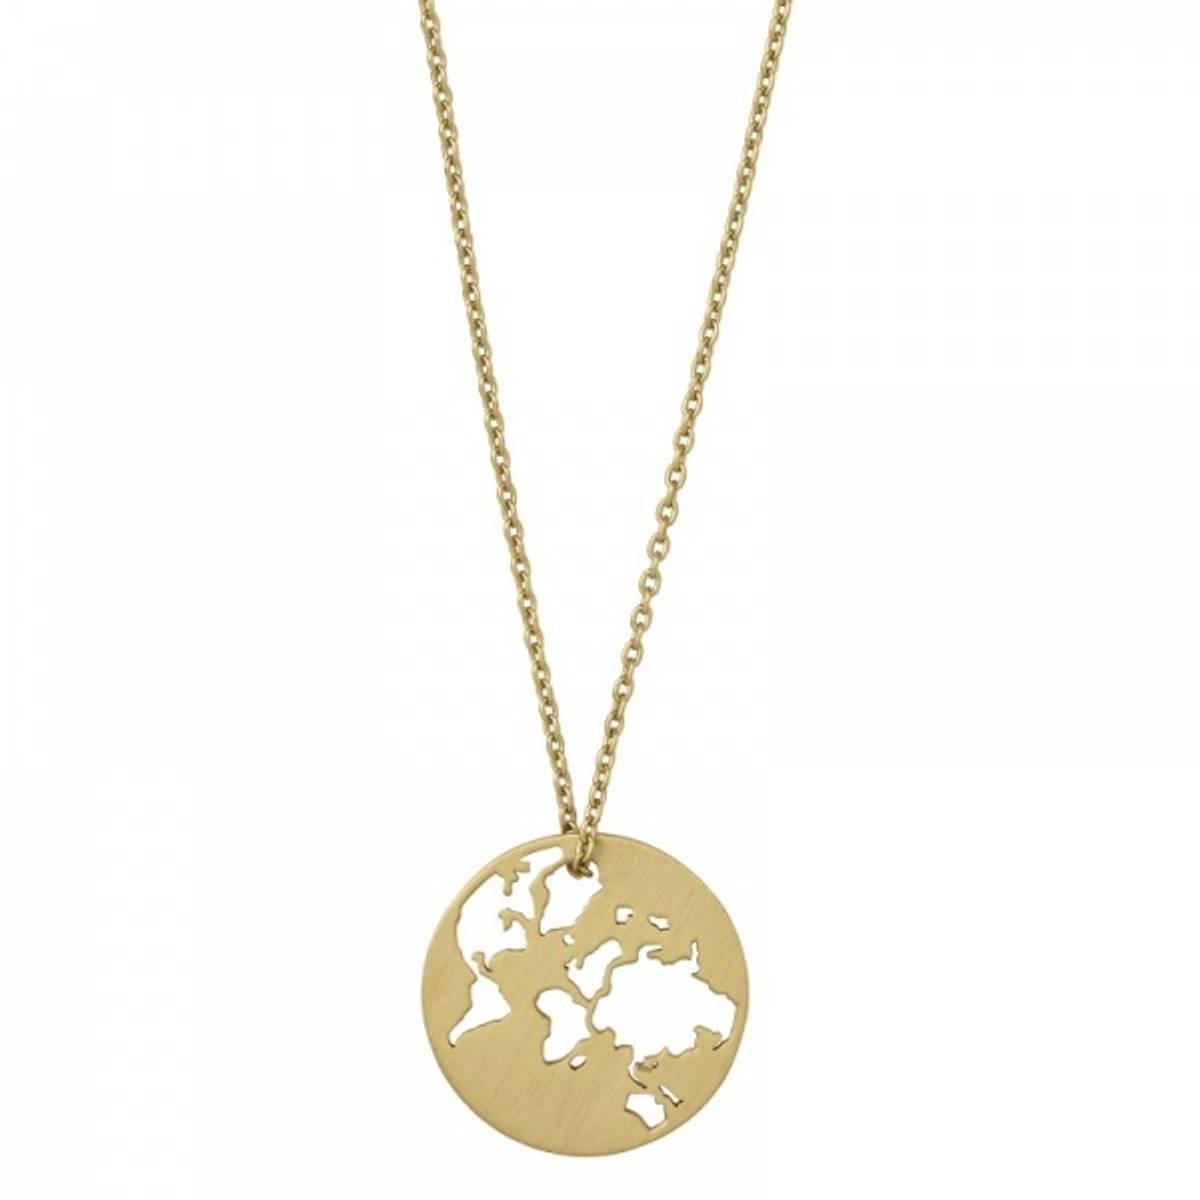 Beautiful World necklace - gold 45cm